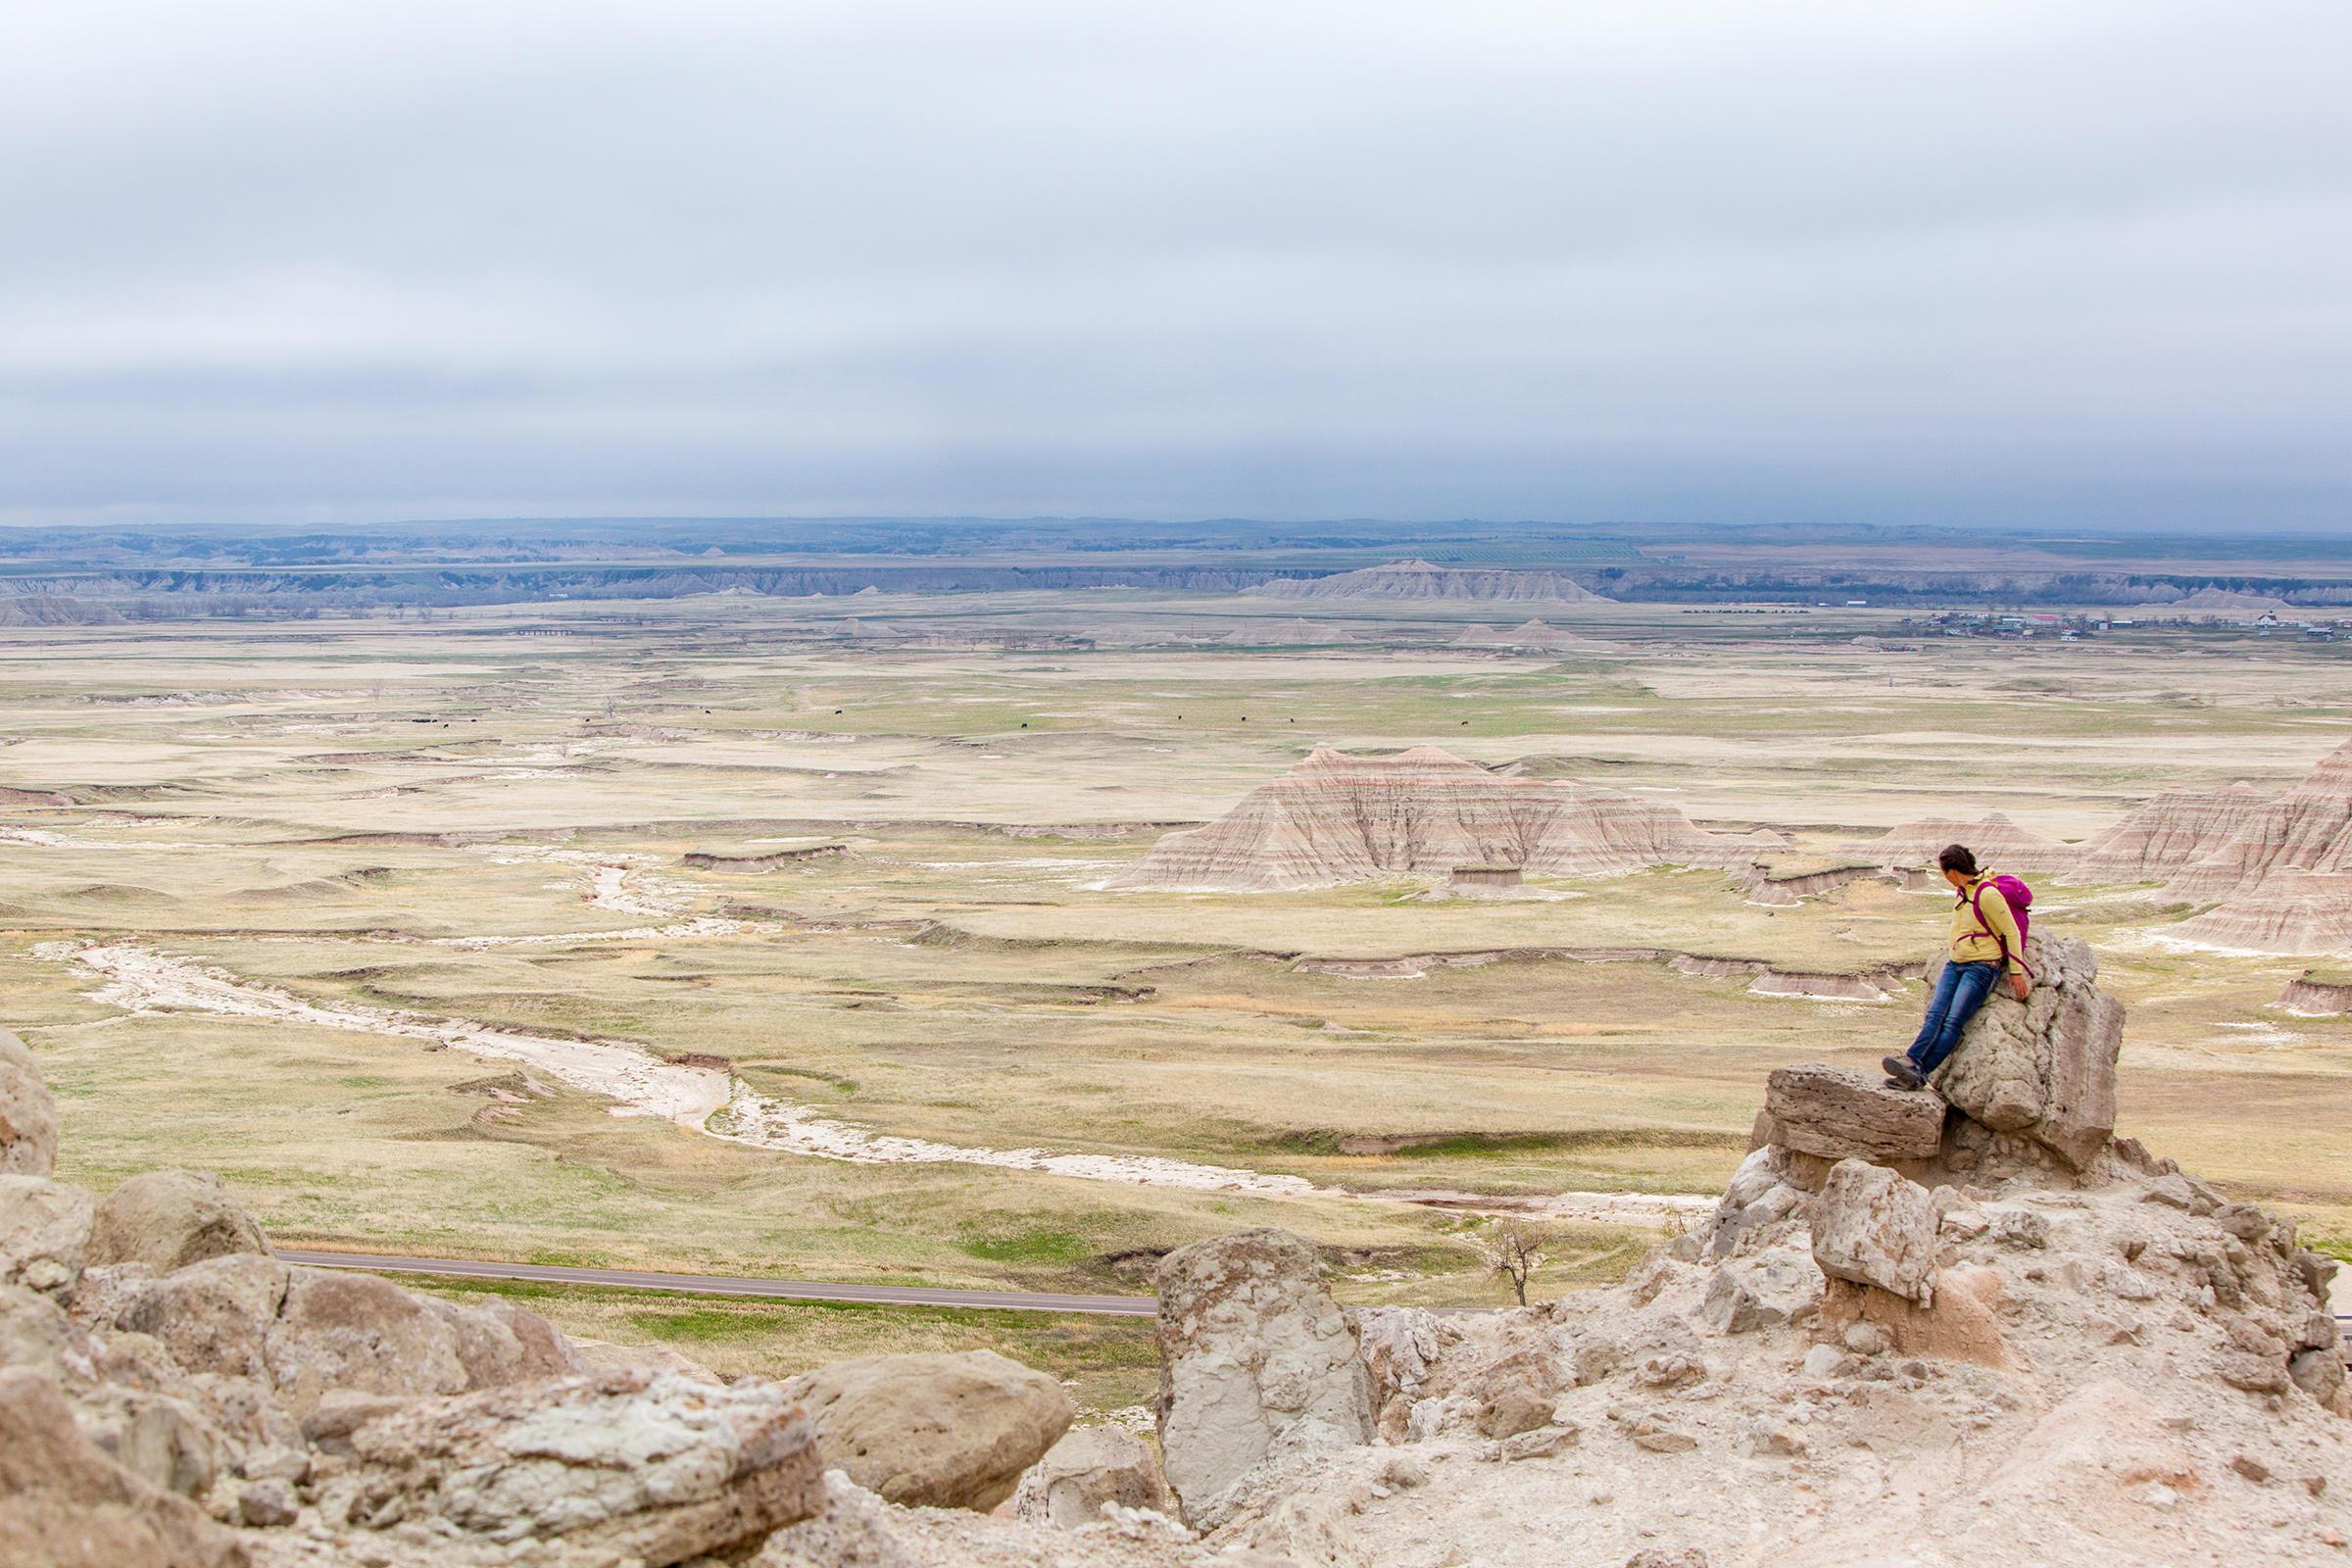 Saddle Pass Trail in the Badlands National Park, South Dakota. Ben Herndon/Tandemstock.com